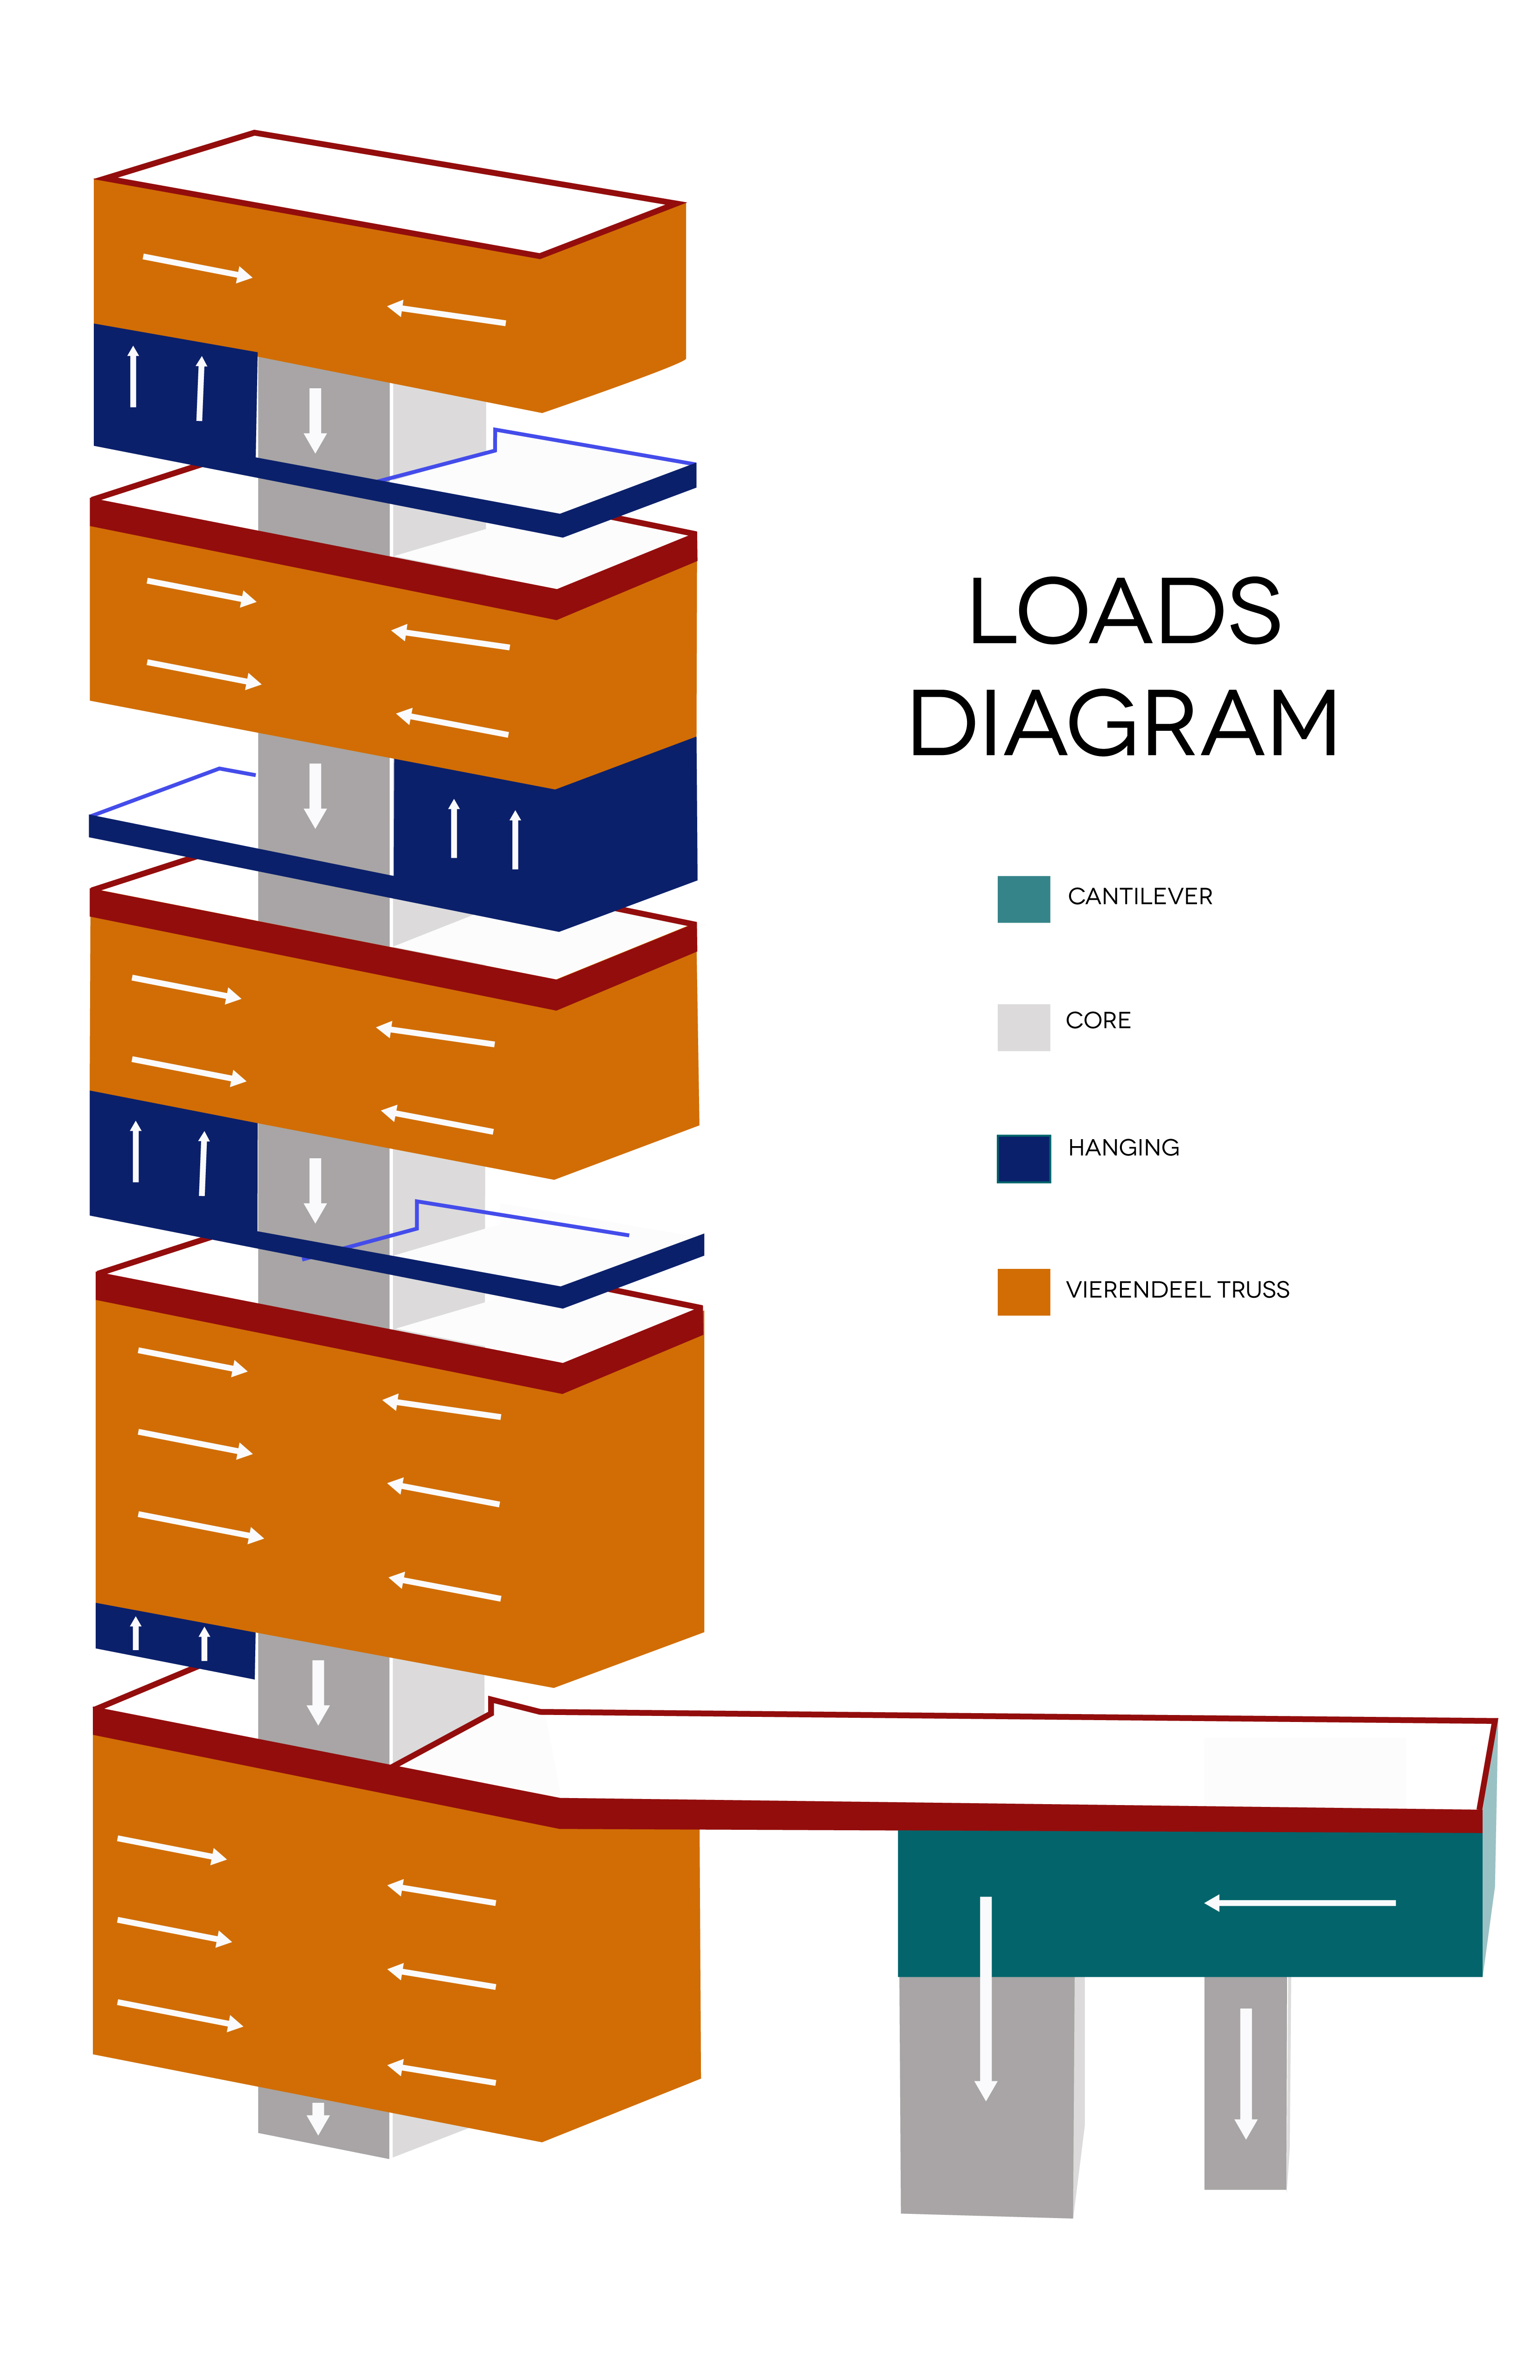 Loads Diagram